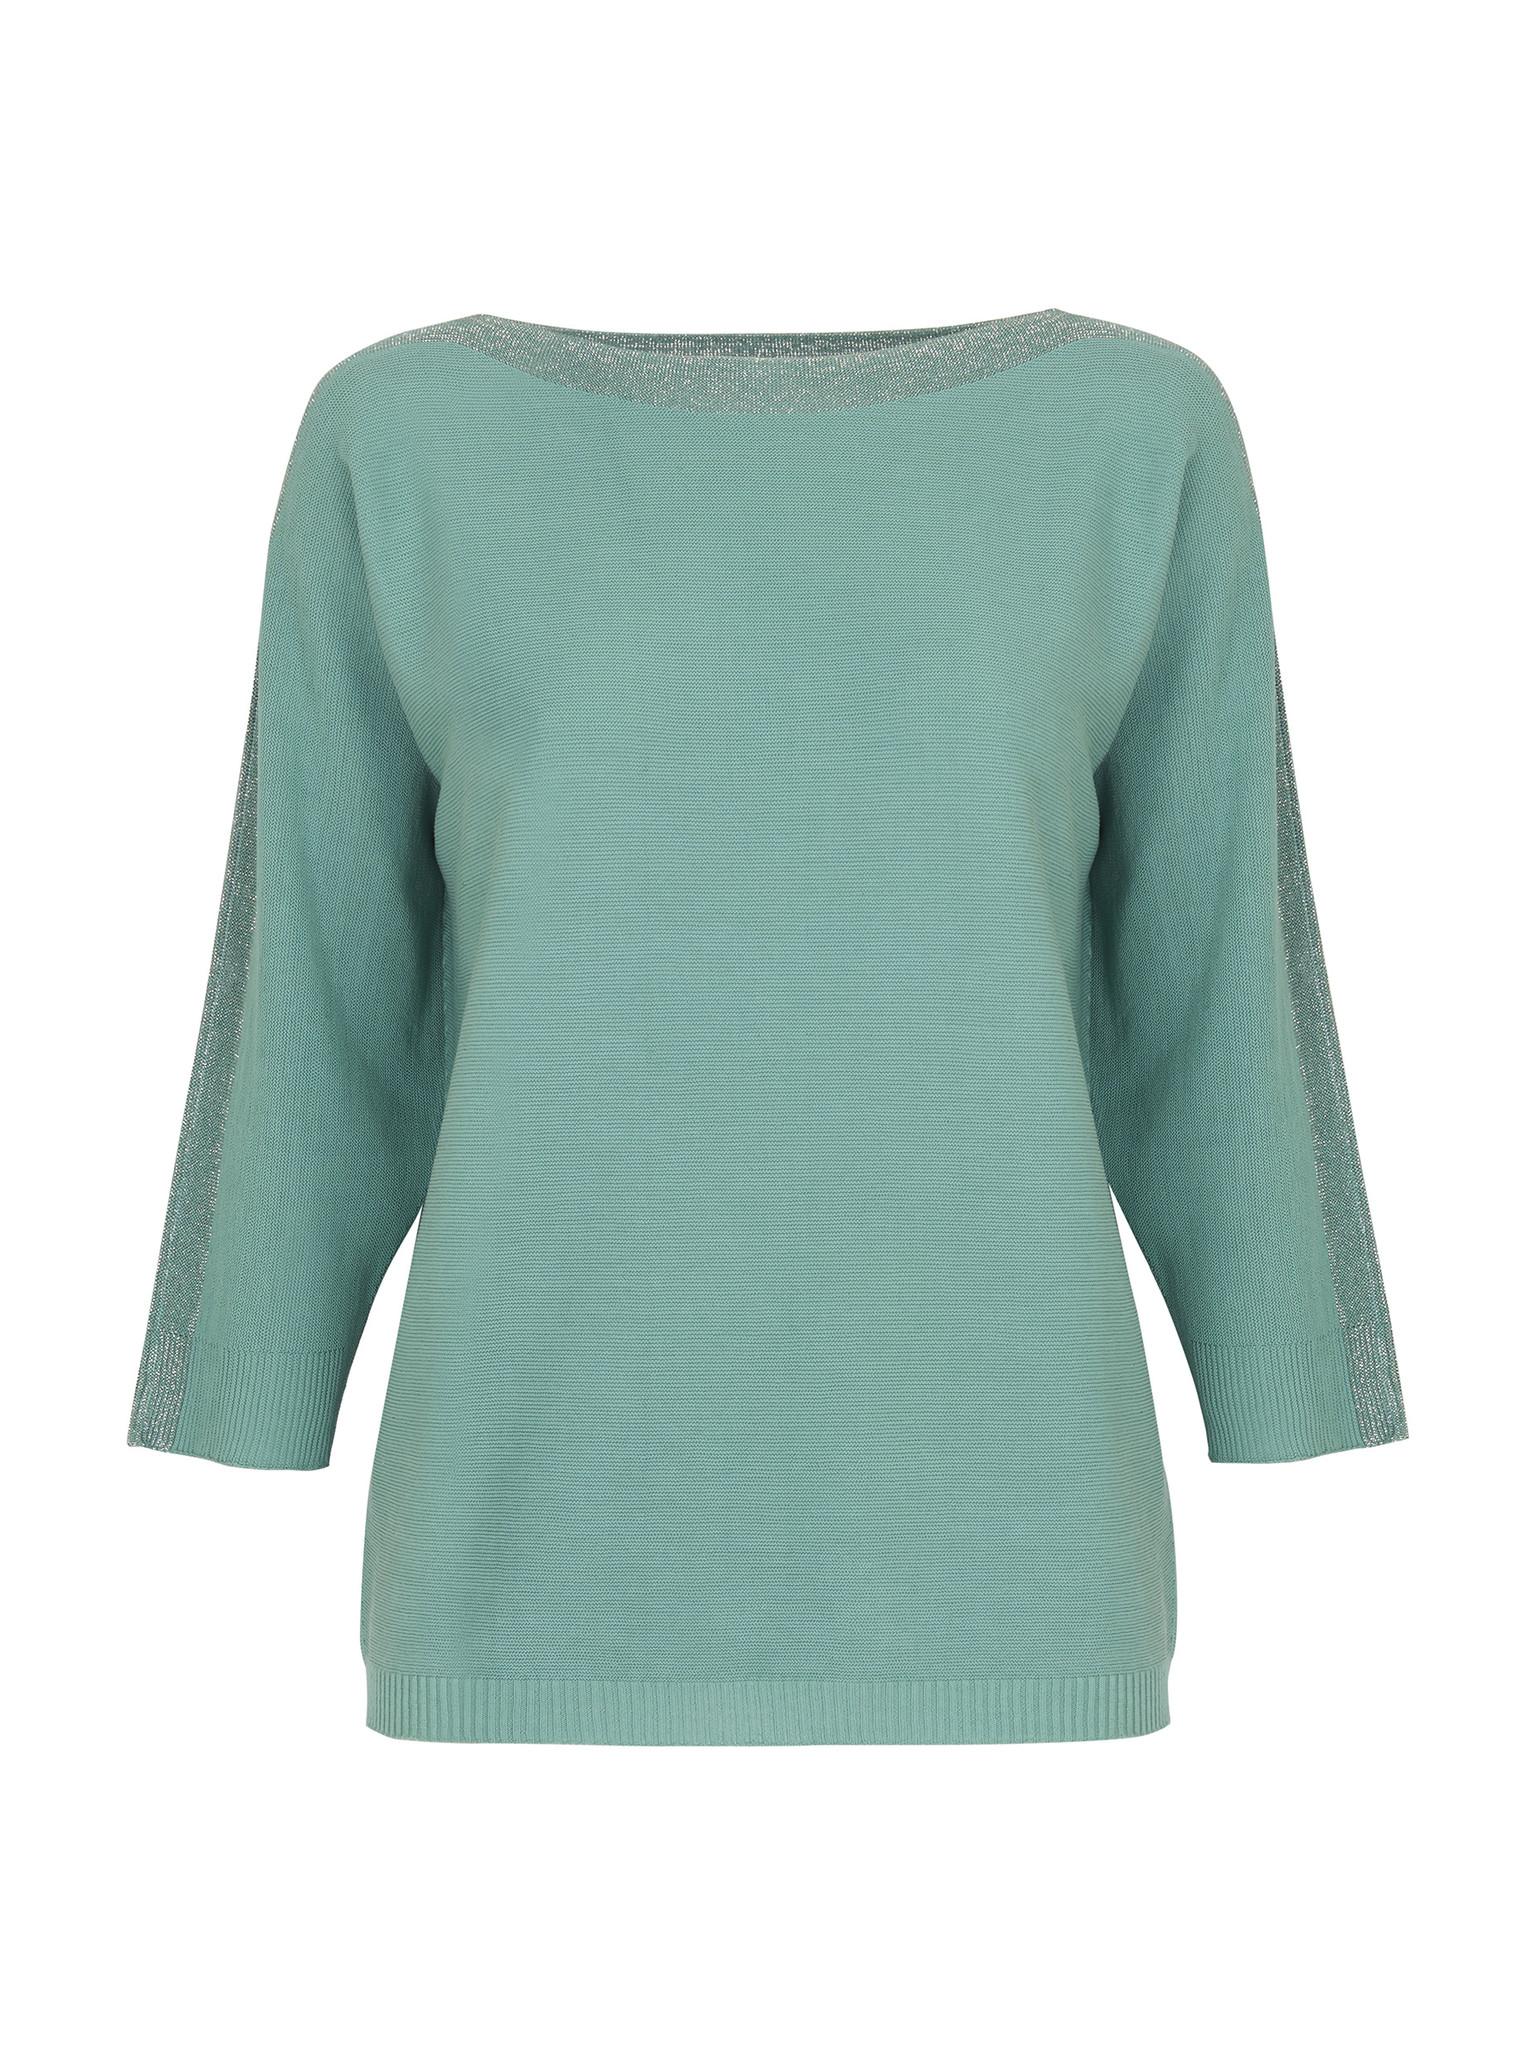 nomansland sweater 55.116-1